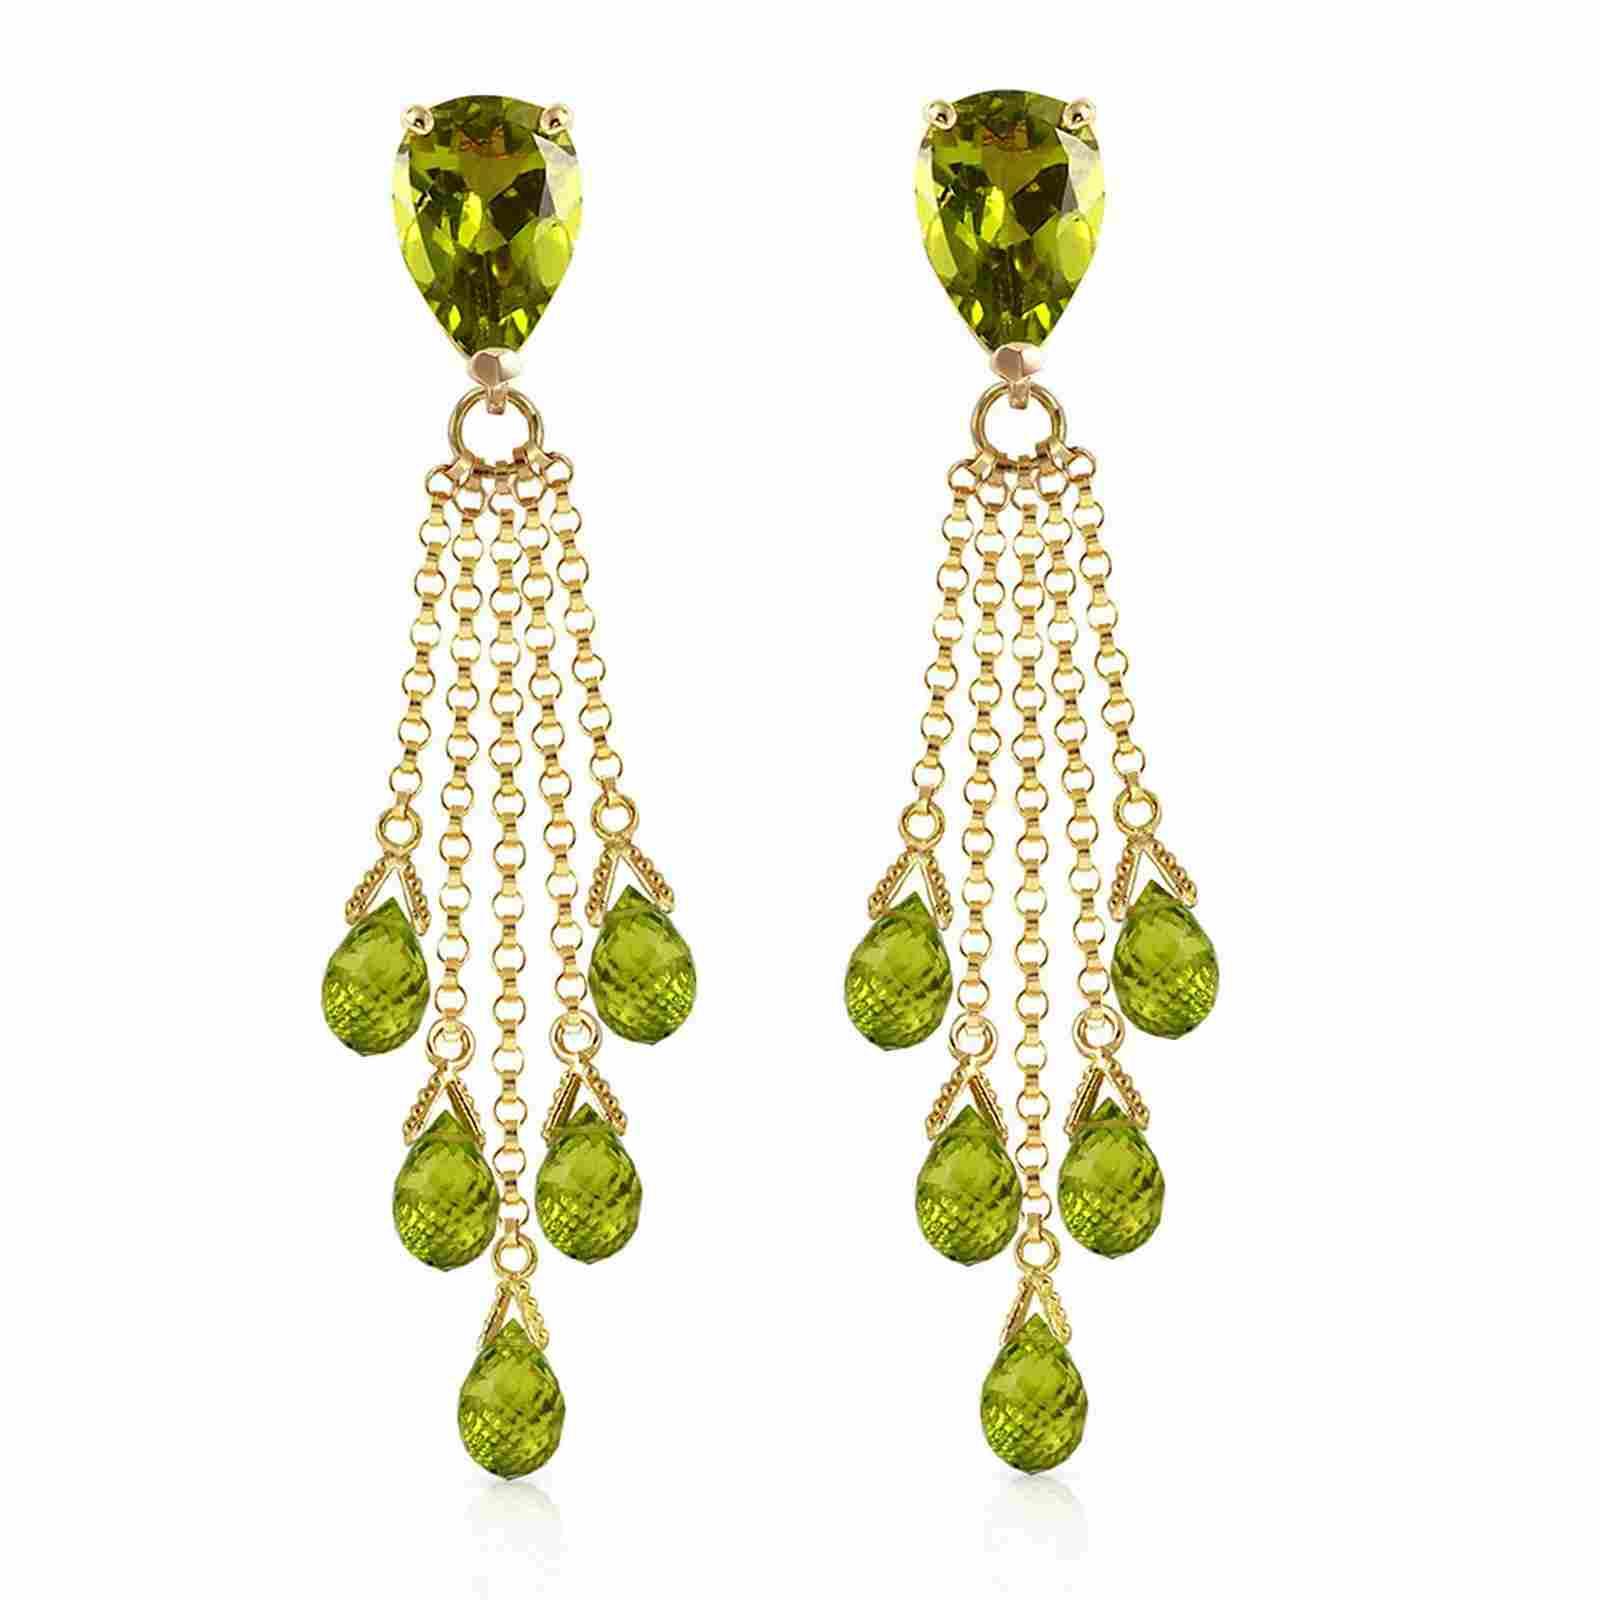 15.5 Carat 14K Solid Gold Playful Peridot Earrings